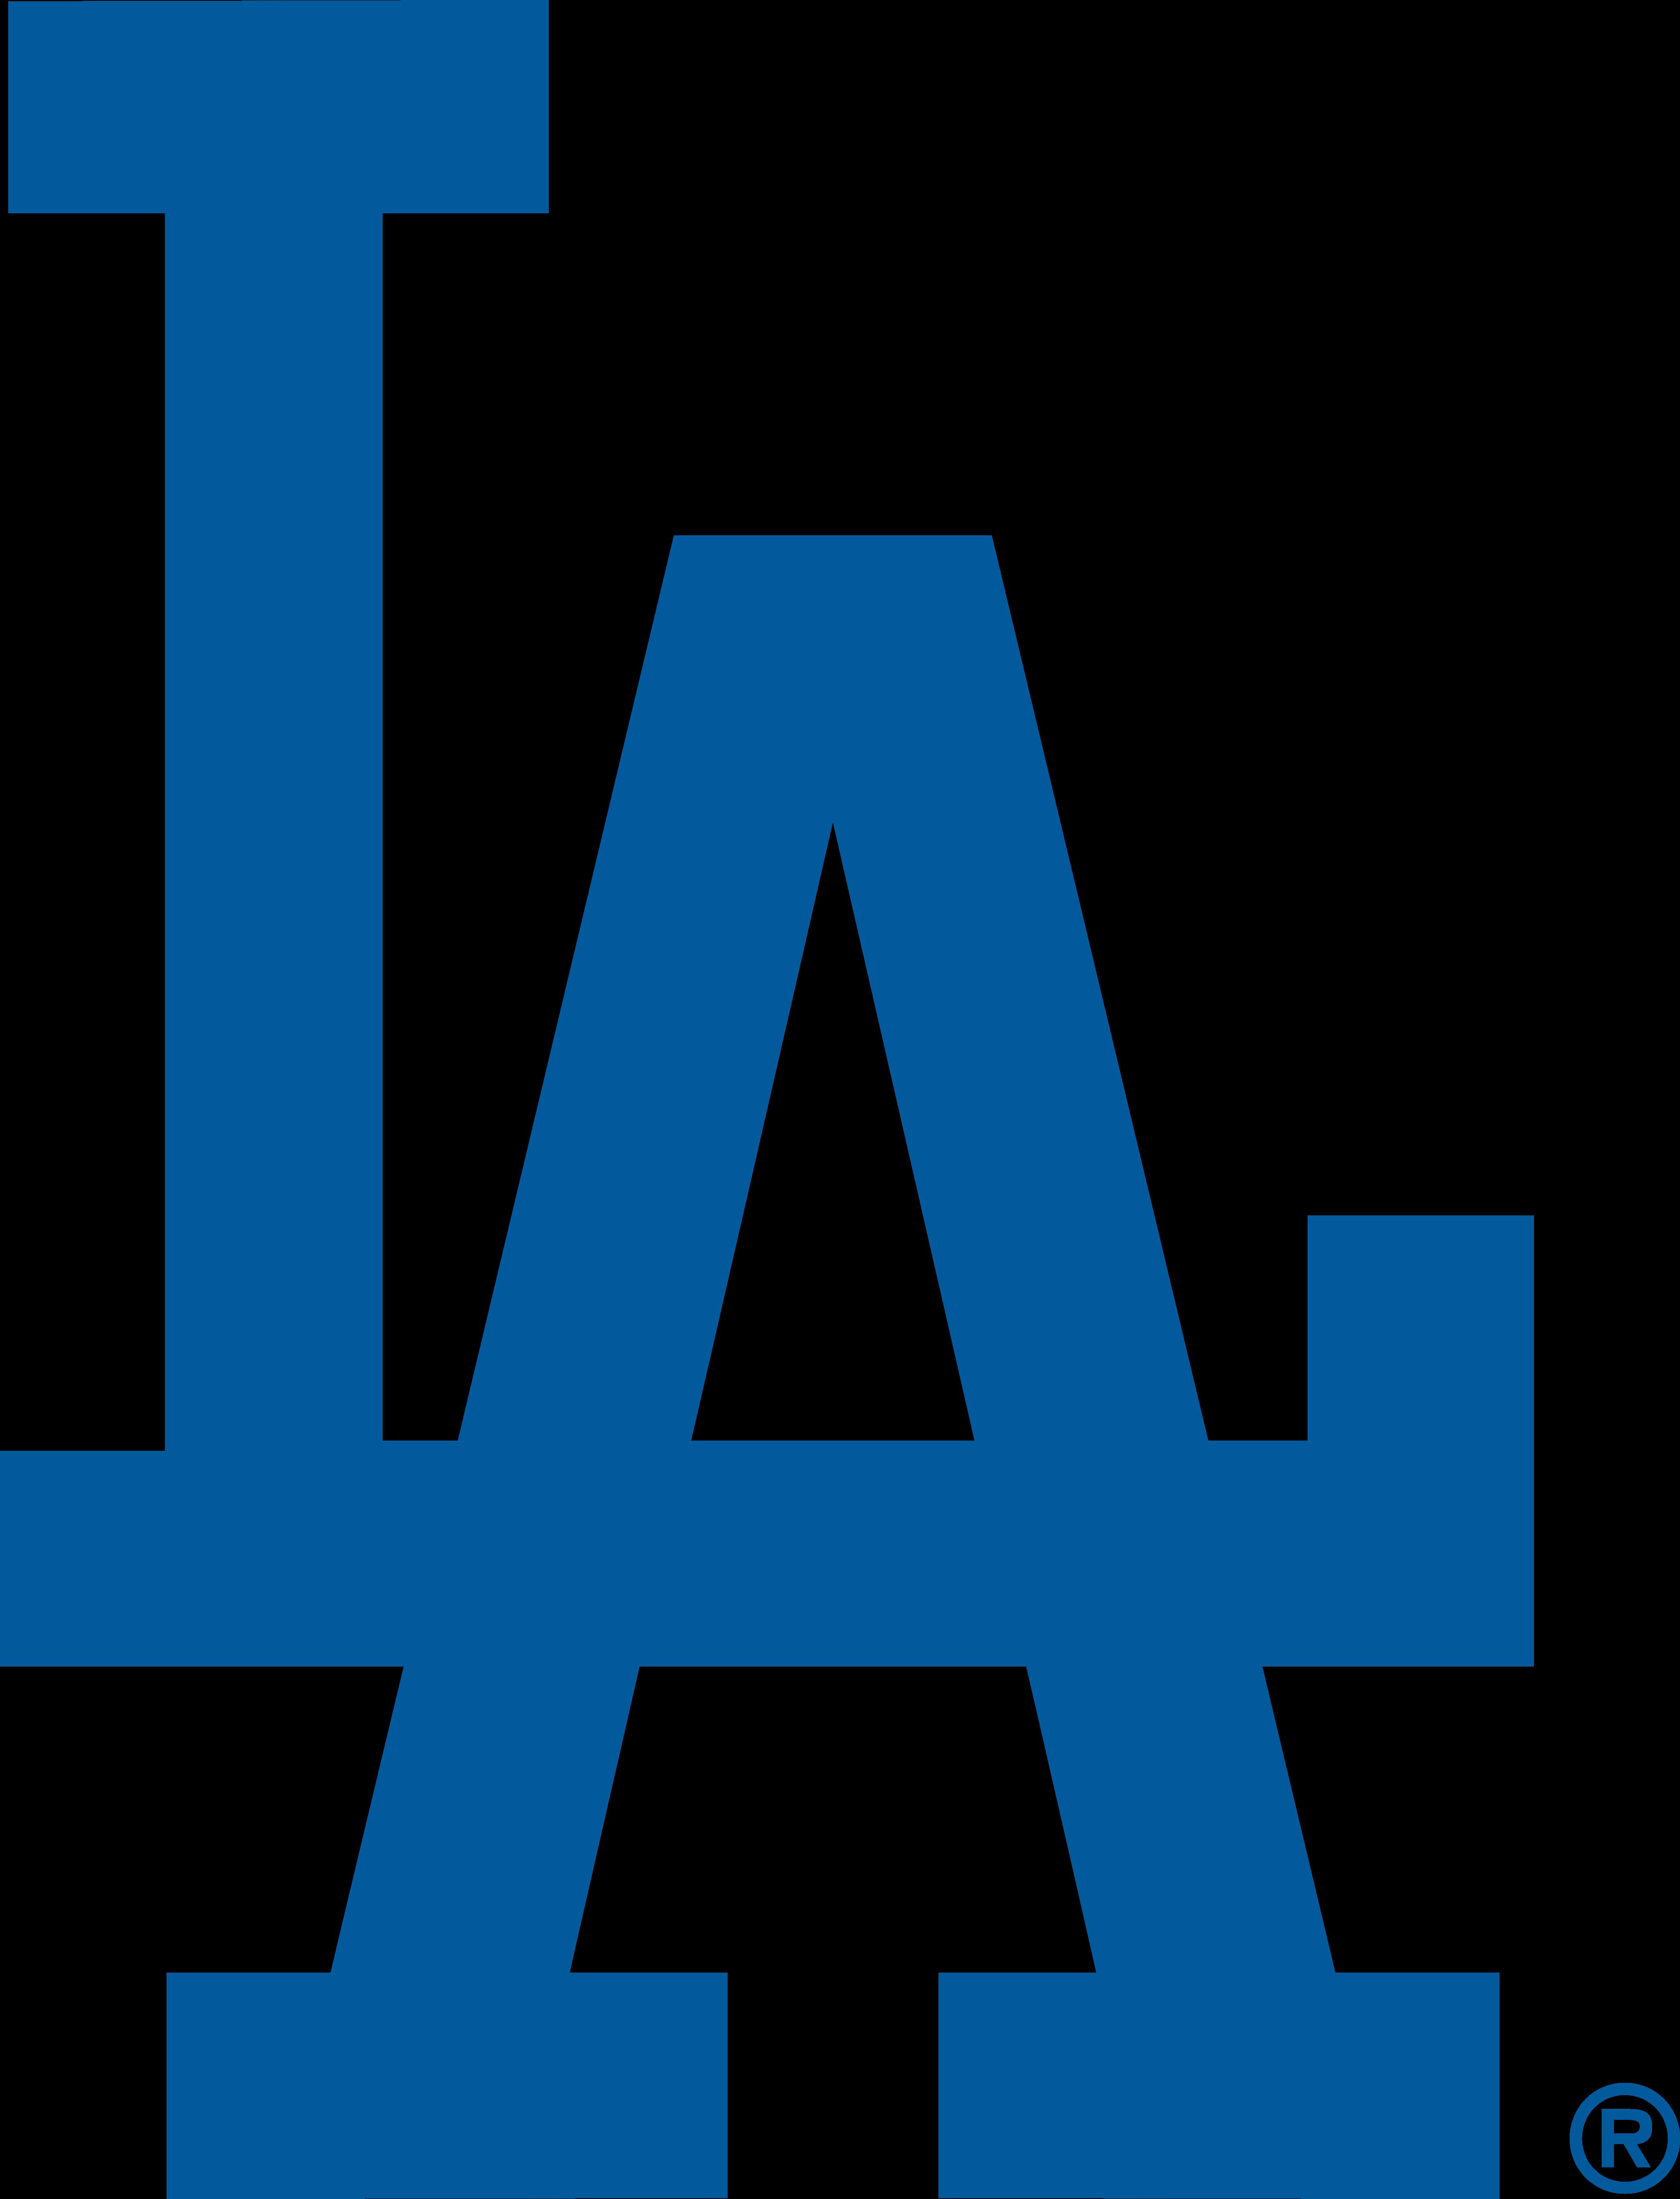 los angeles dodgers logo - Los Angeles Dodgers Logo